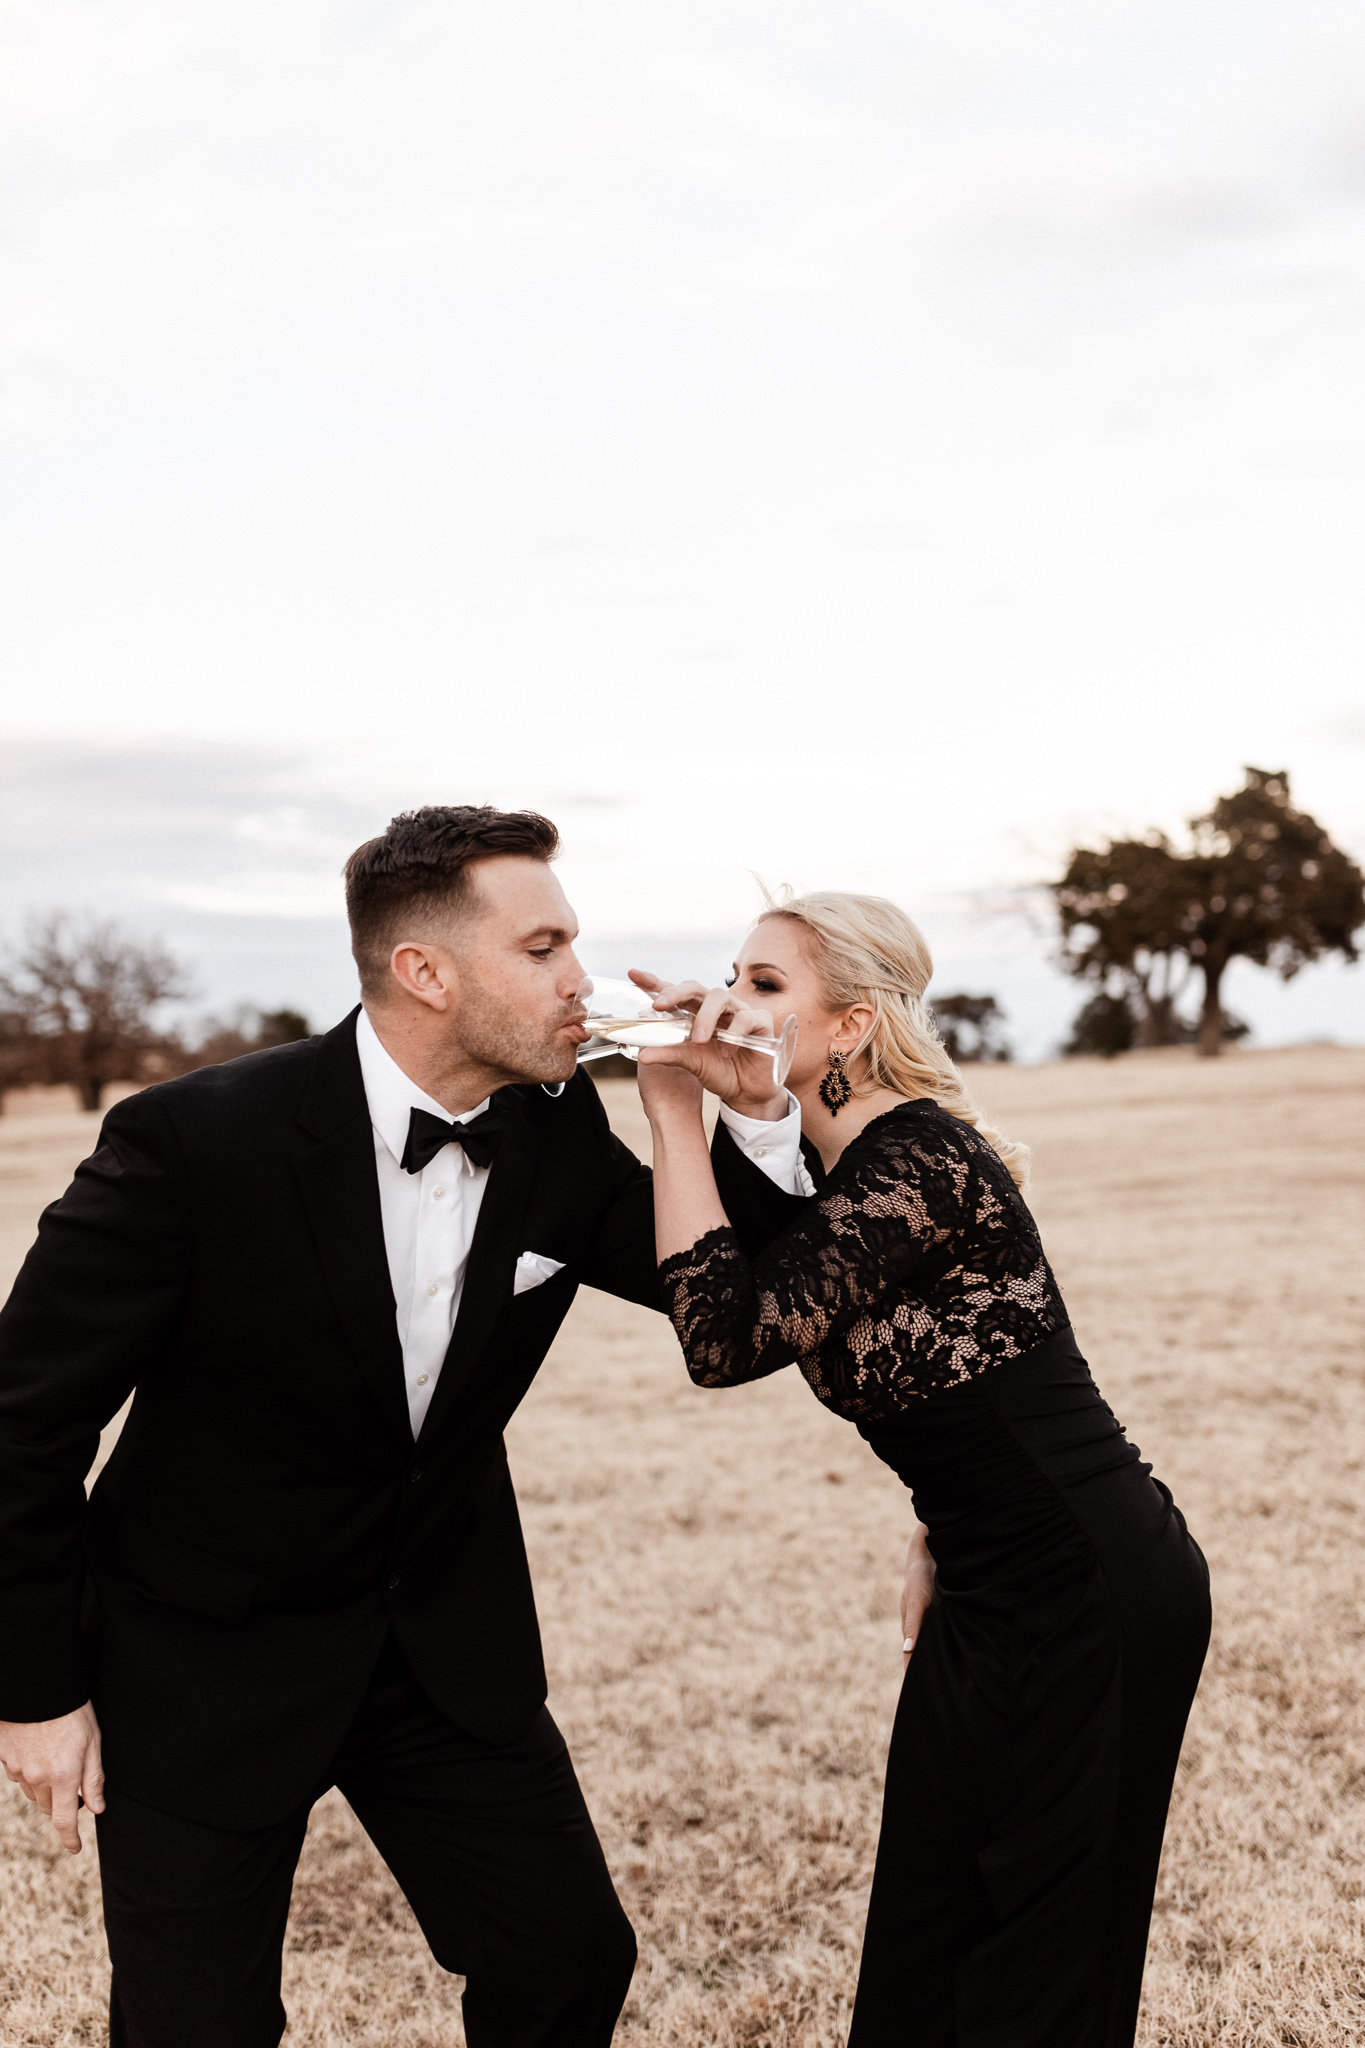 Wade + Stephanie | Warm Open Field Engagements | Oklahoma Wedding Photographer-53.jpg